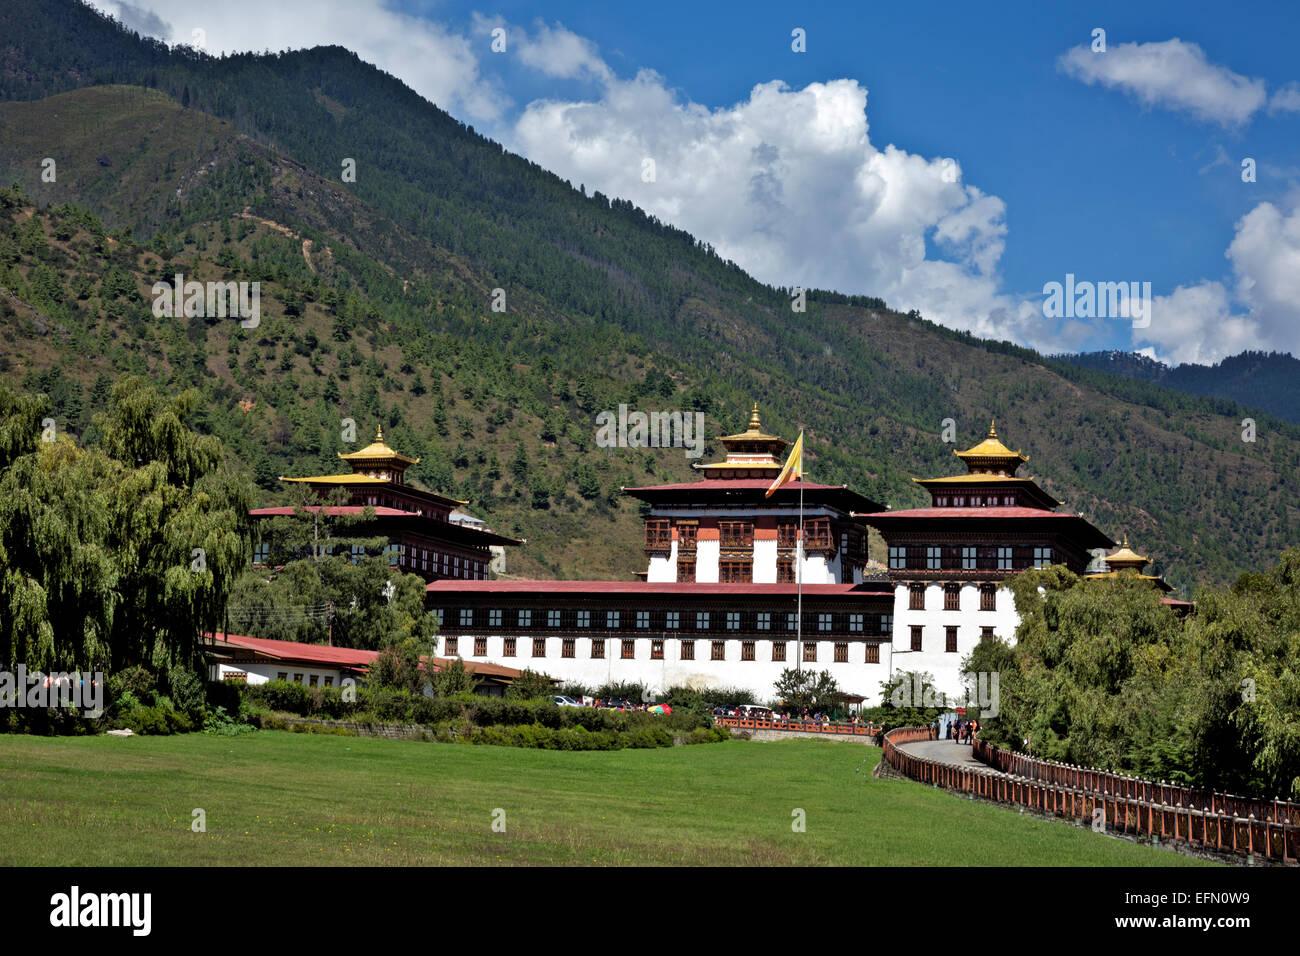 BU00048-00...BHOUTAN -l'Trashi Chhoe Dzong, les principaux édifices gouvernementaux dans la capitale Thimphu. Photo Stock